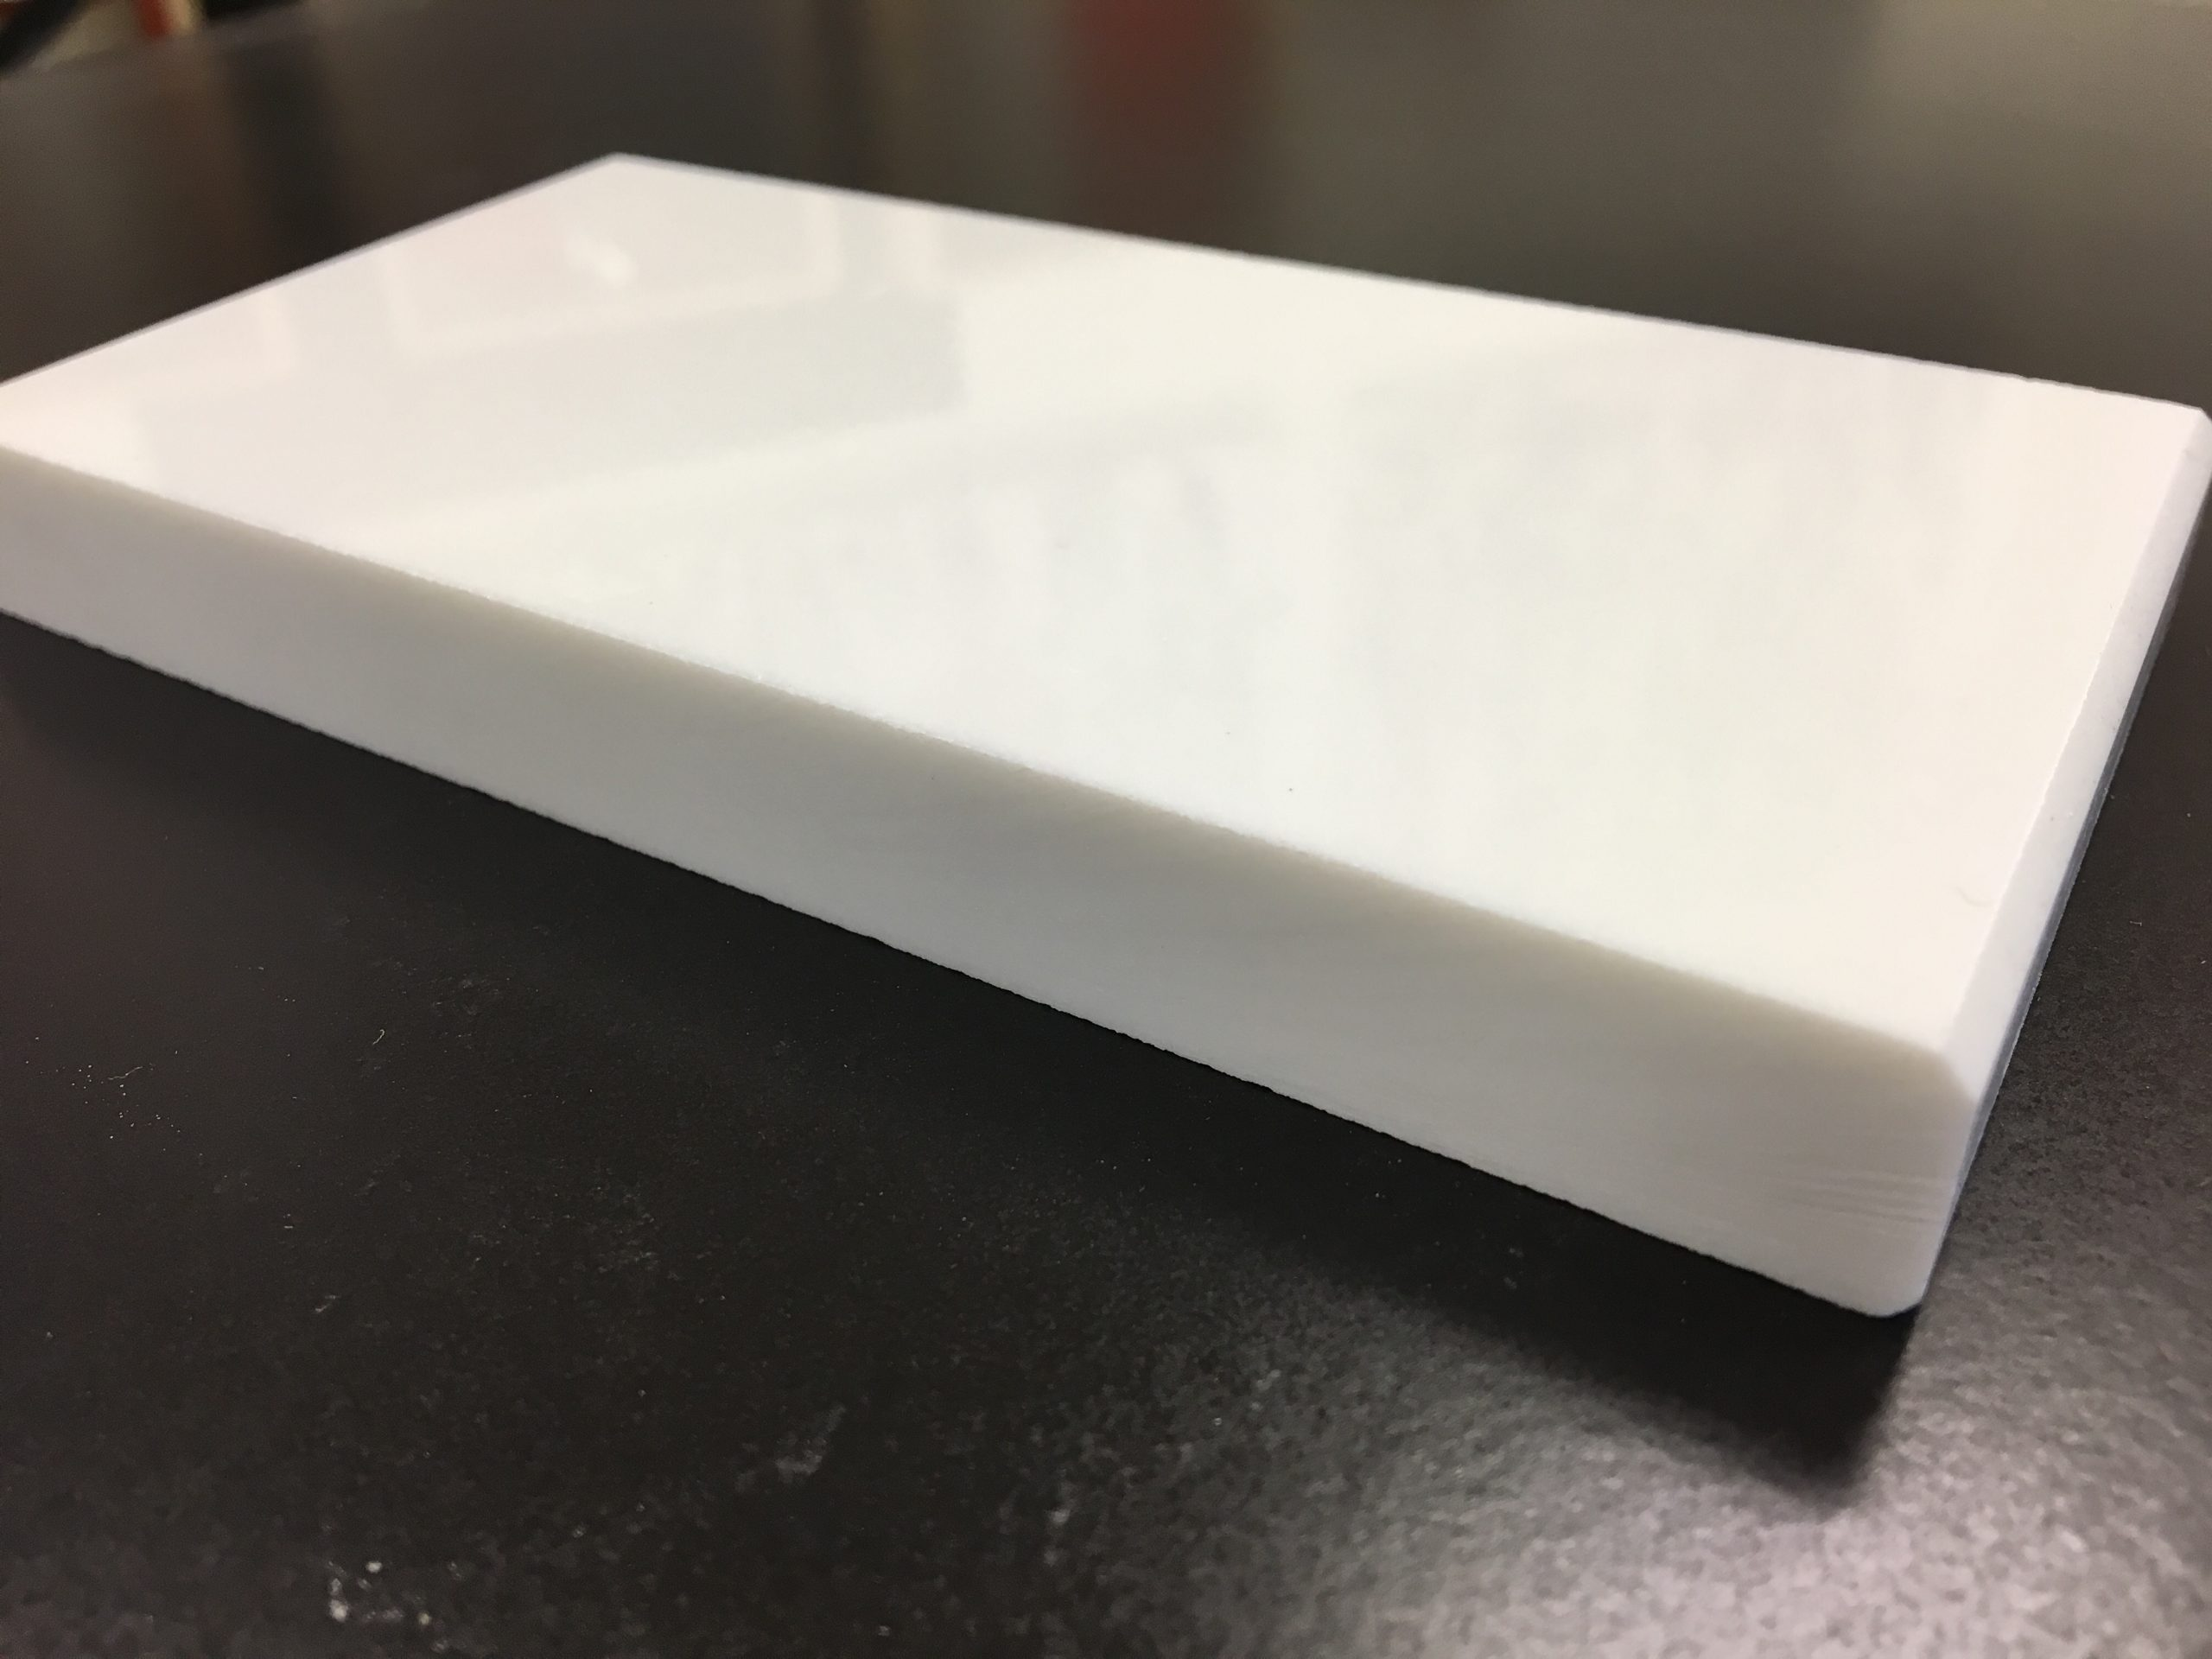 Ultra White Sills | Marble Trend | Marble, Granite, Tiles | Toronto